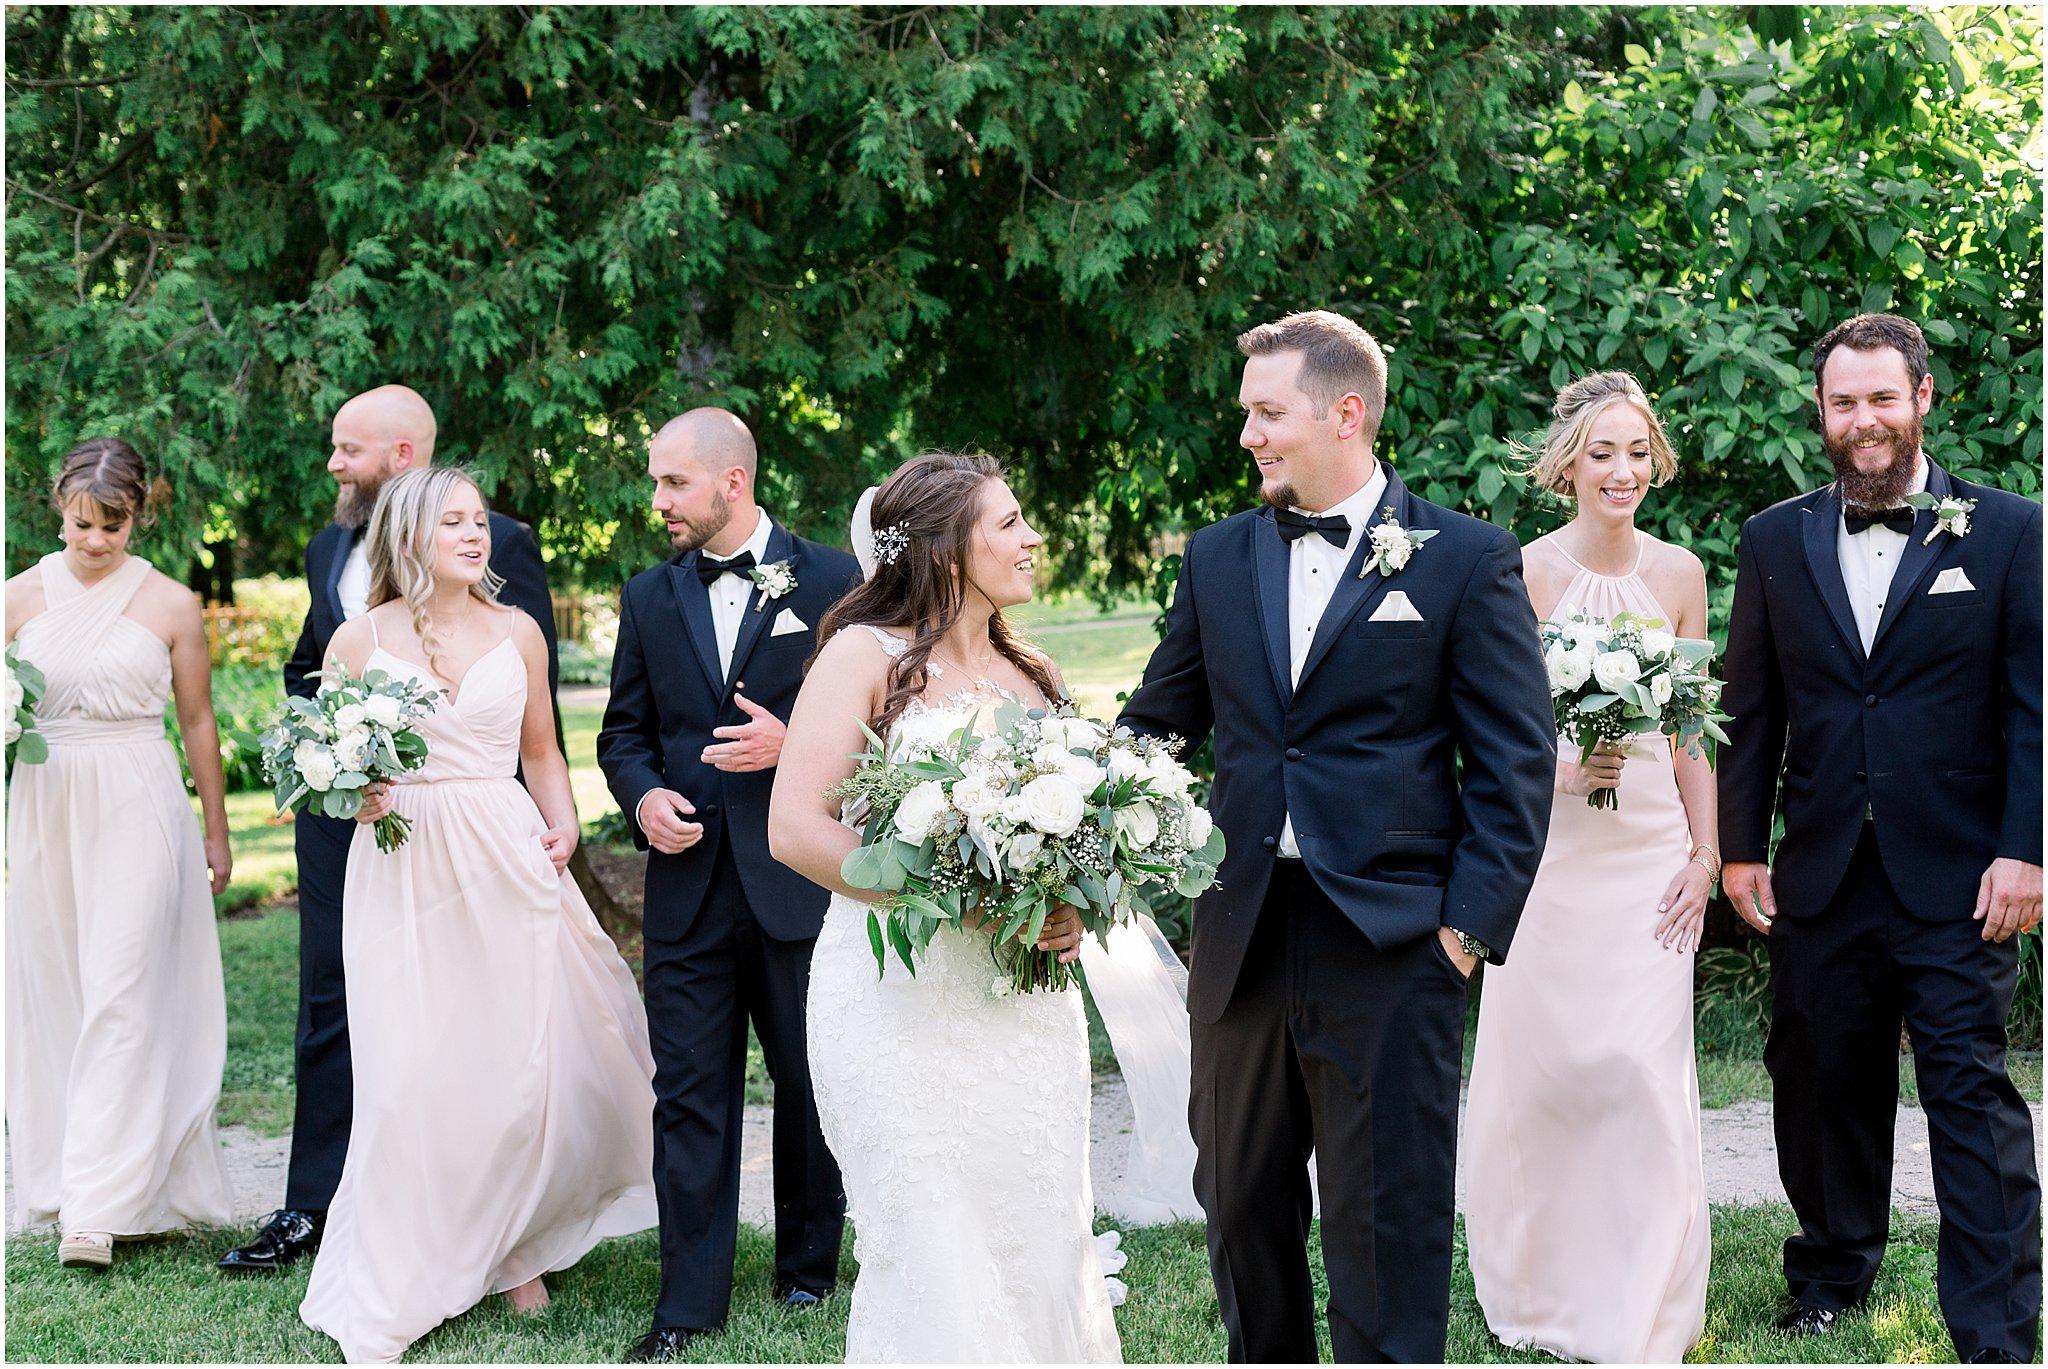 company-251-summer-chicago-wedding-photos_0032.jpg